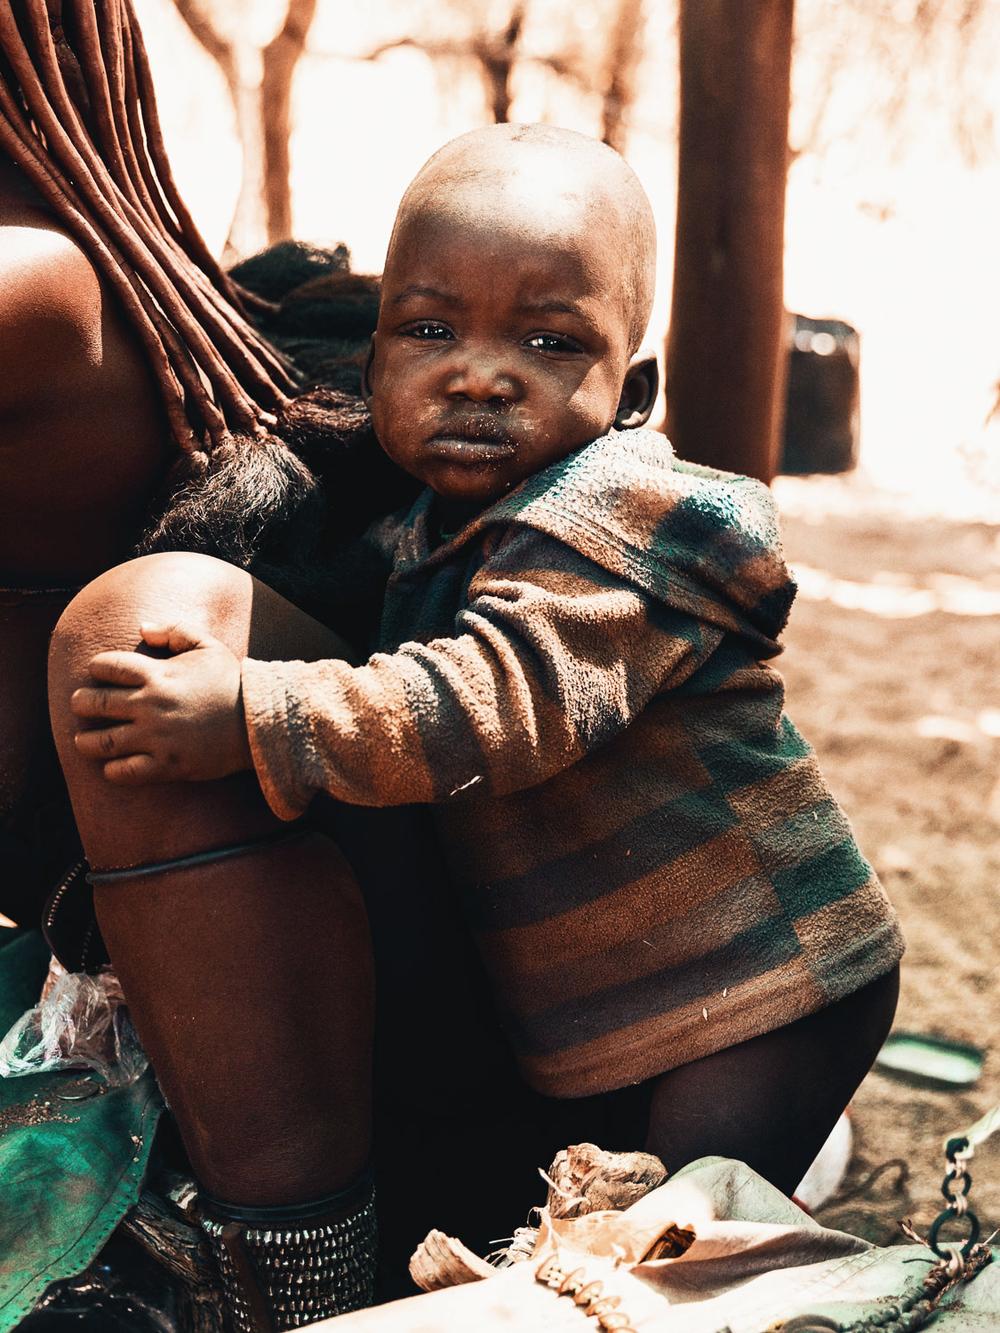 CallieGiovanna_Africa_Namibia_20150101_01378.jpg